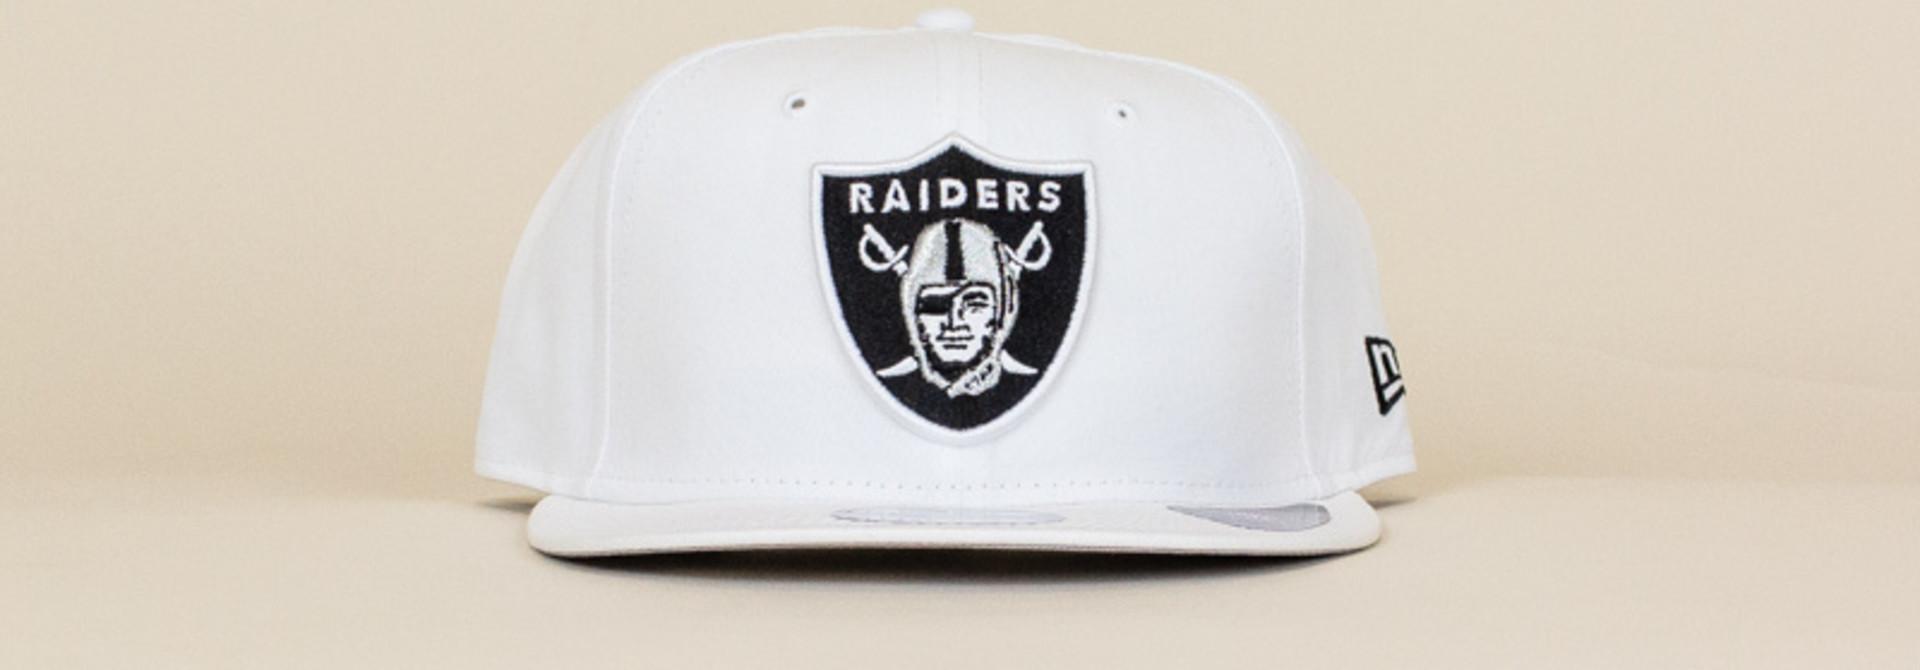 New Era Las Vegas Raiders Snapback Hat - White